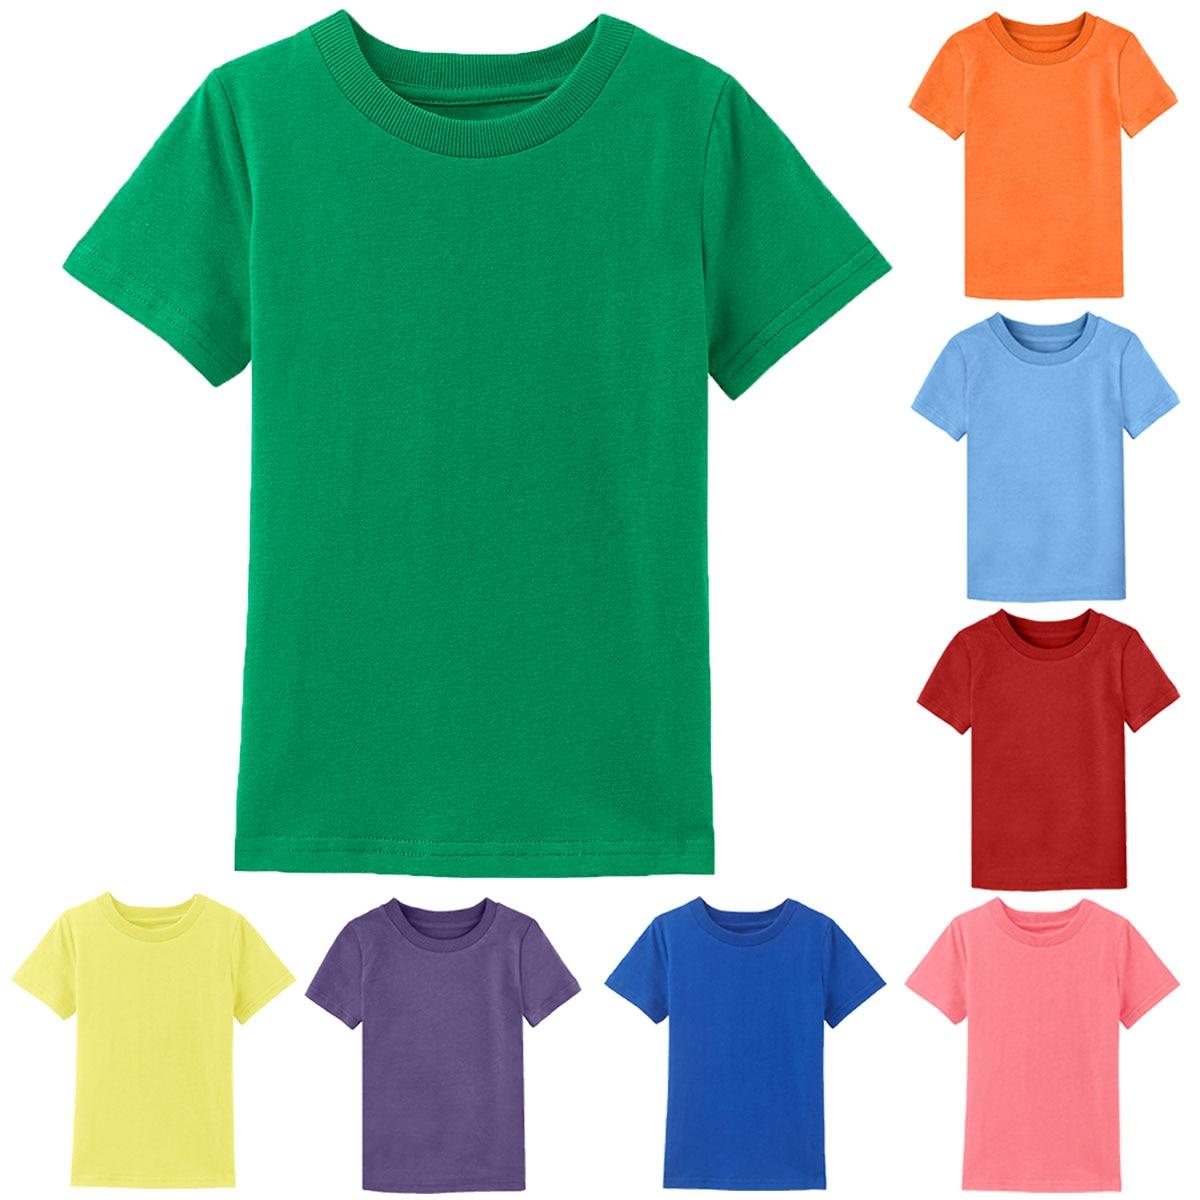 3-15 Yset T shirt Kids Tee Short Sleeve  Tops Children Clothes Toddler Shirts